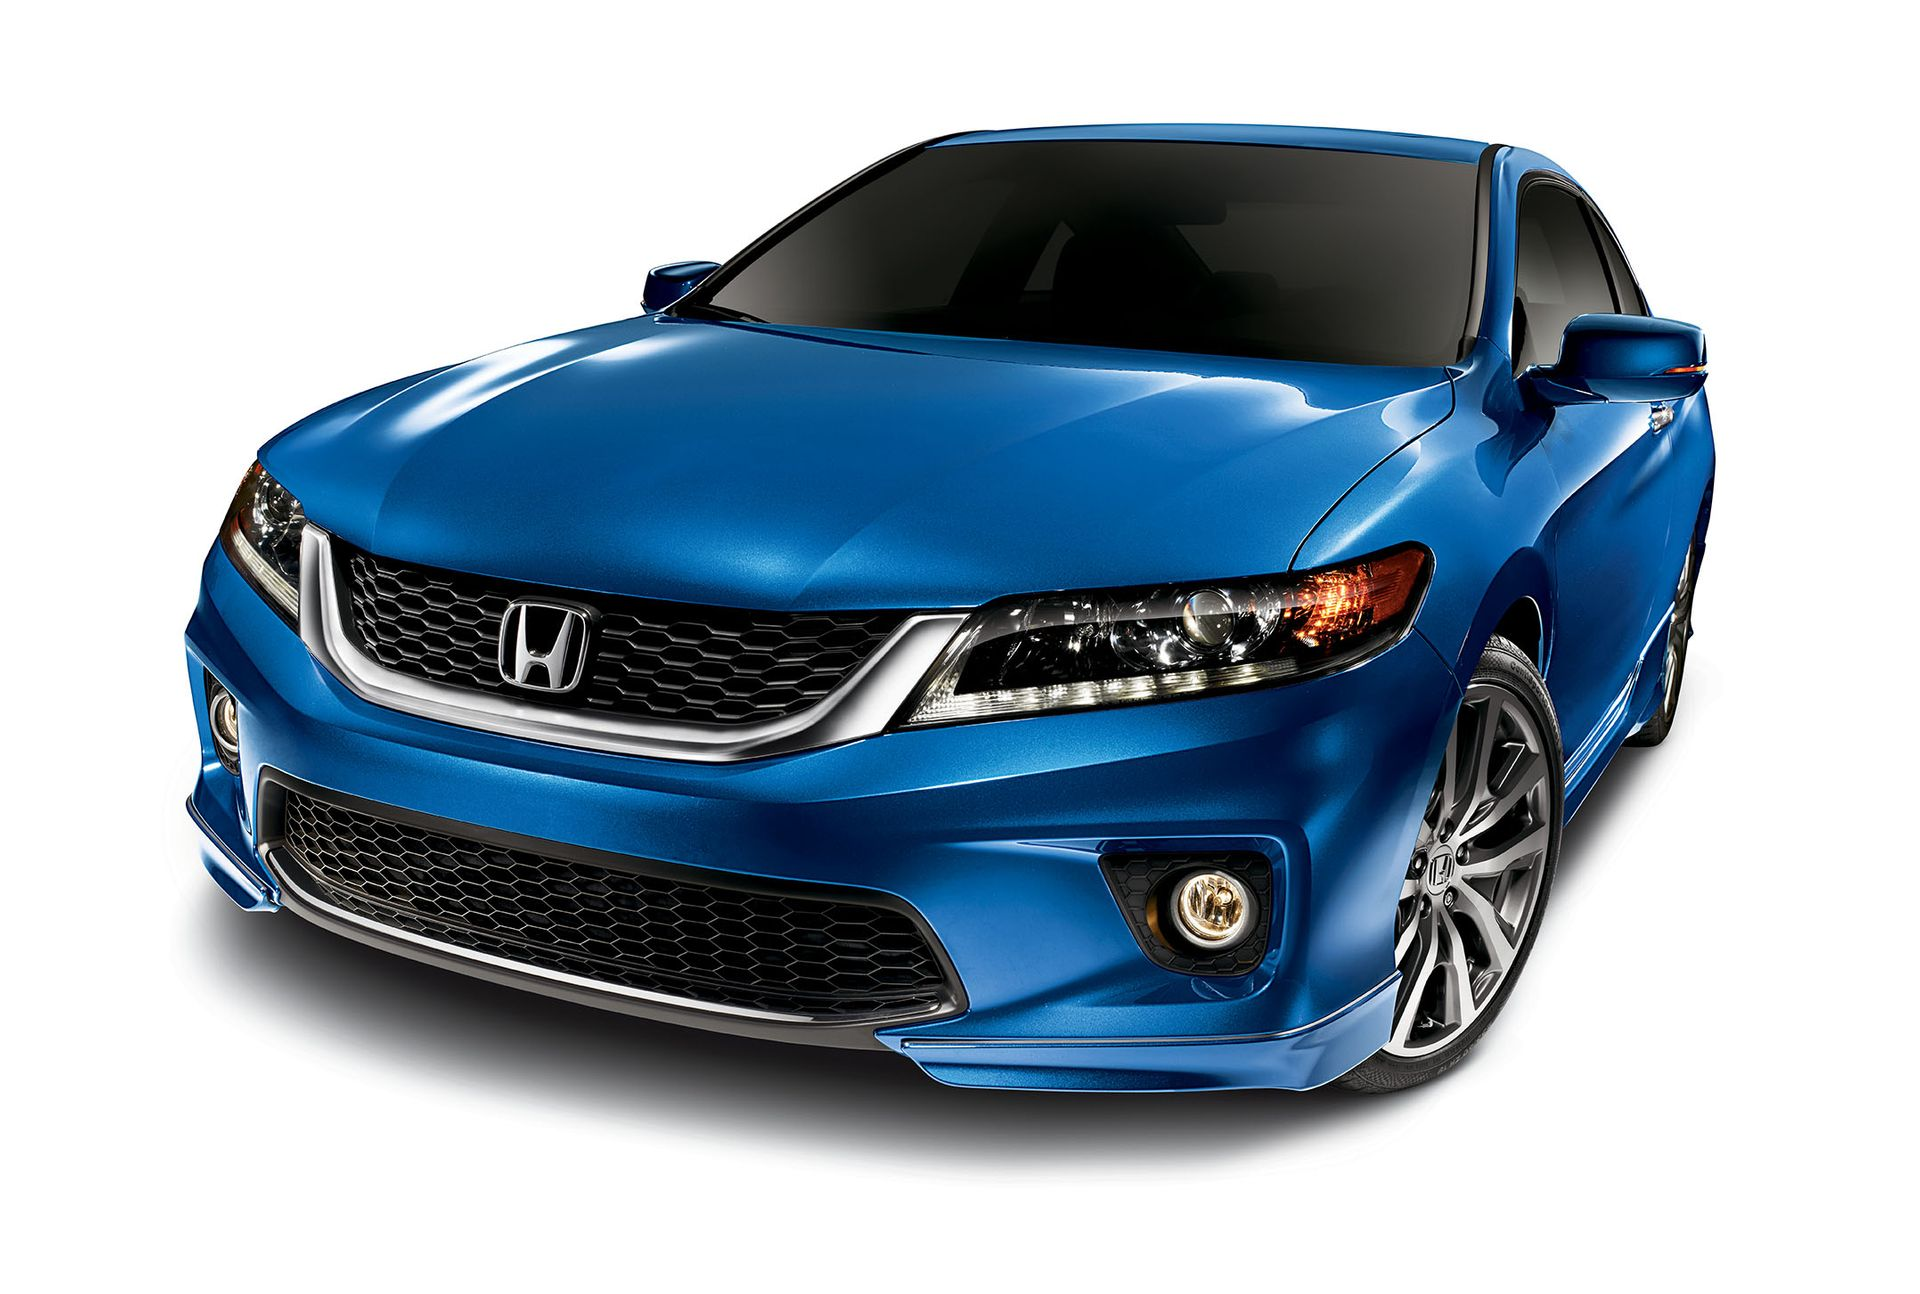 HONDA ACCORD 2013 COUPE V-6 GENUINE OEM HFP PACKAGE - Honda (2013-ACCORD-HFP-KIT)